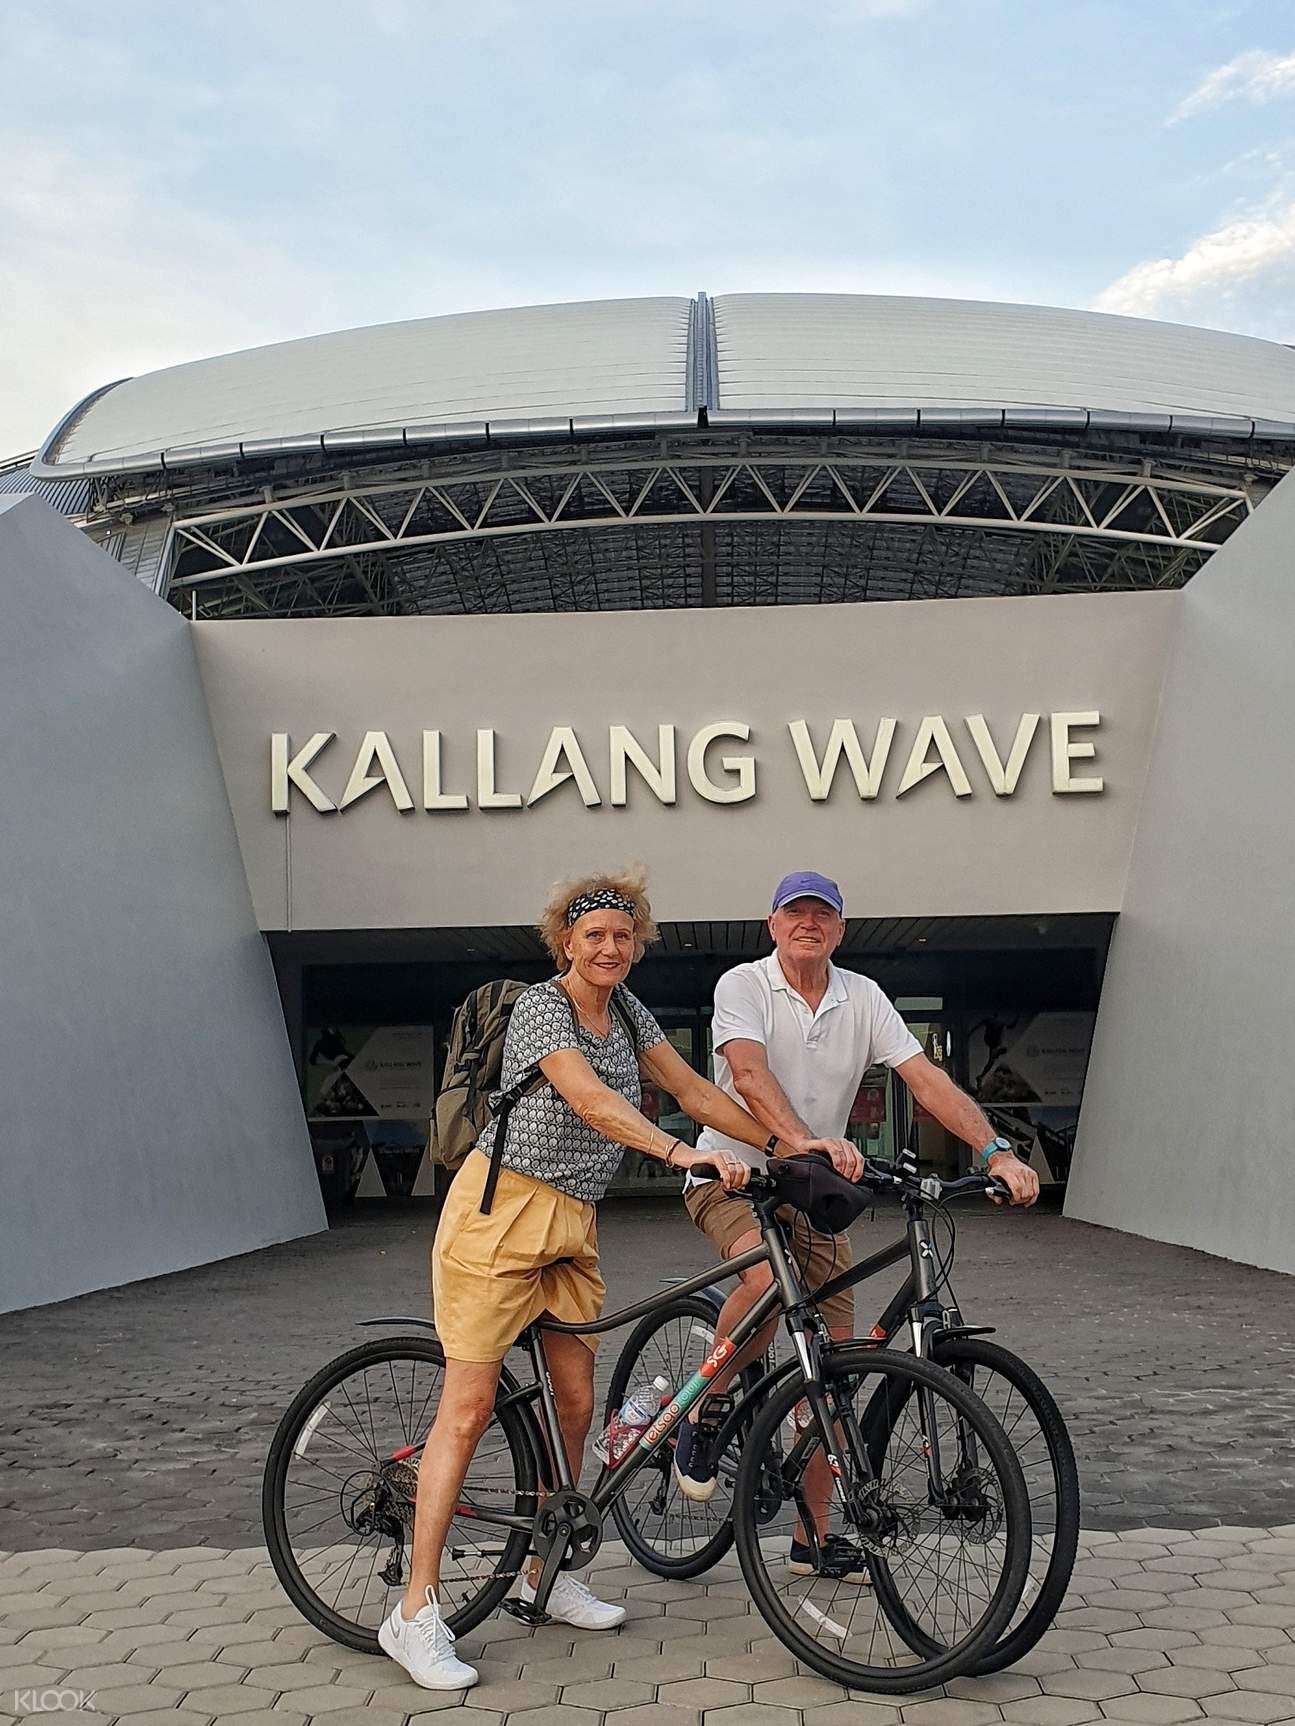 Kallang Wave